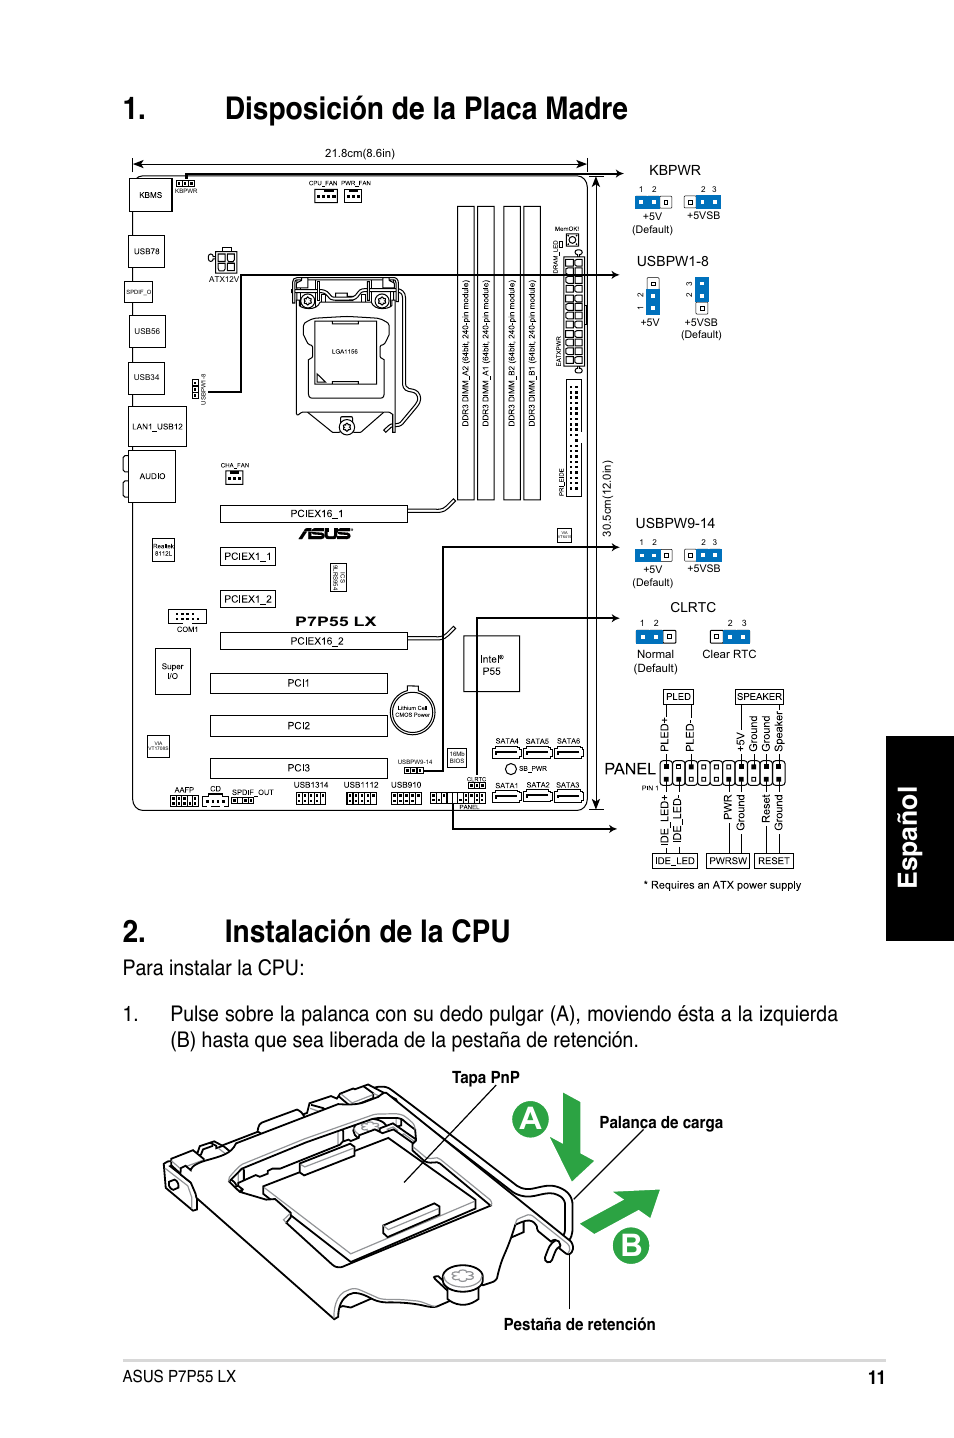 Español, Asus p7p55 lx, Palanca de carga pestaña de